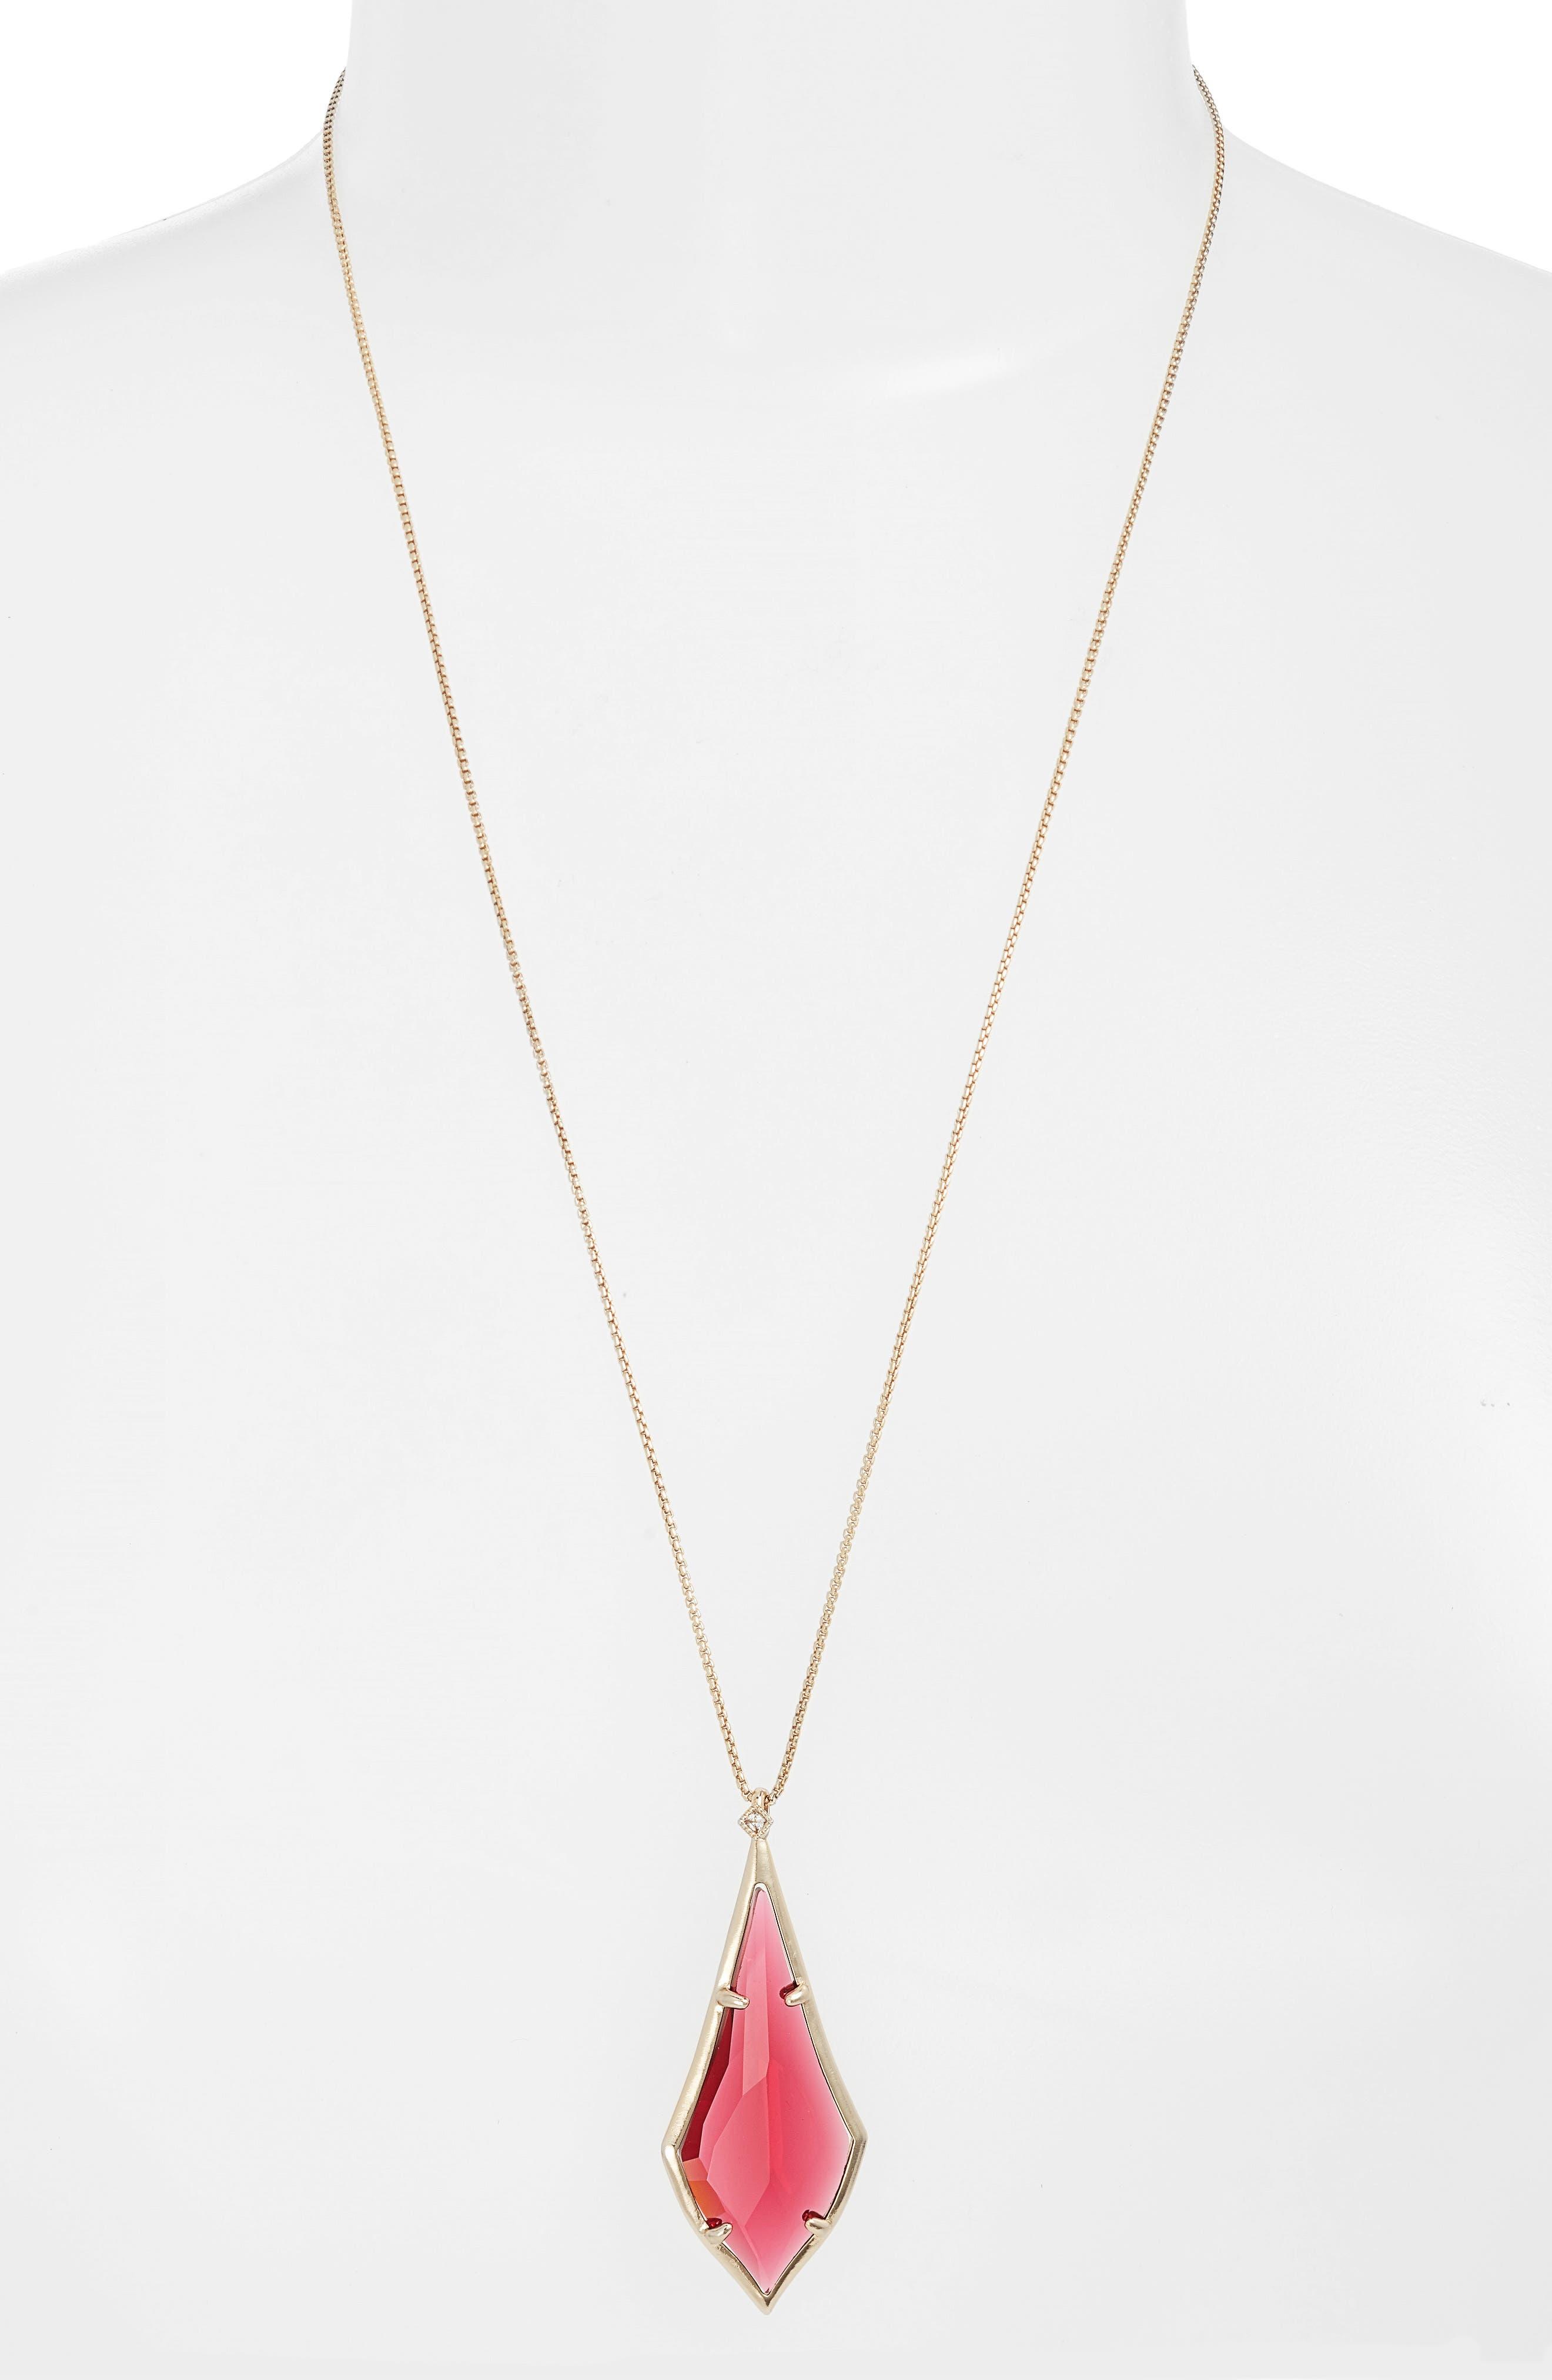 Alternate Image 1 Selected - Kendra Scott Damon Pendant Necklace